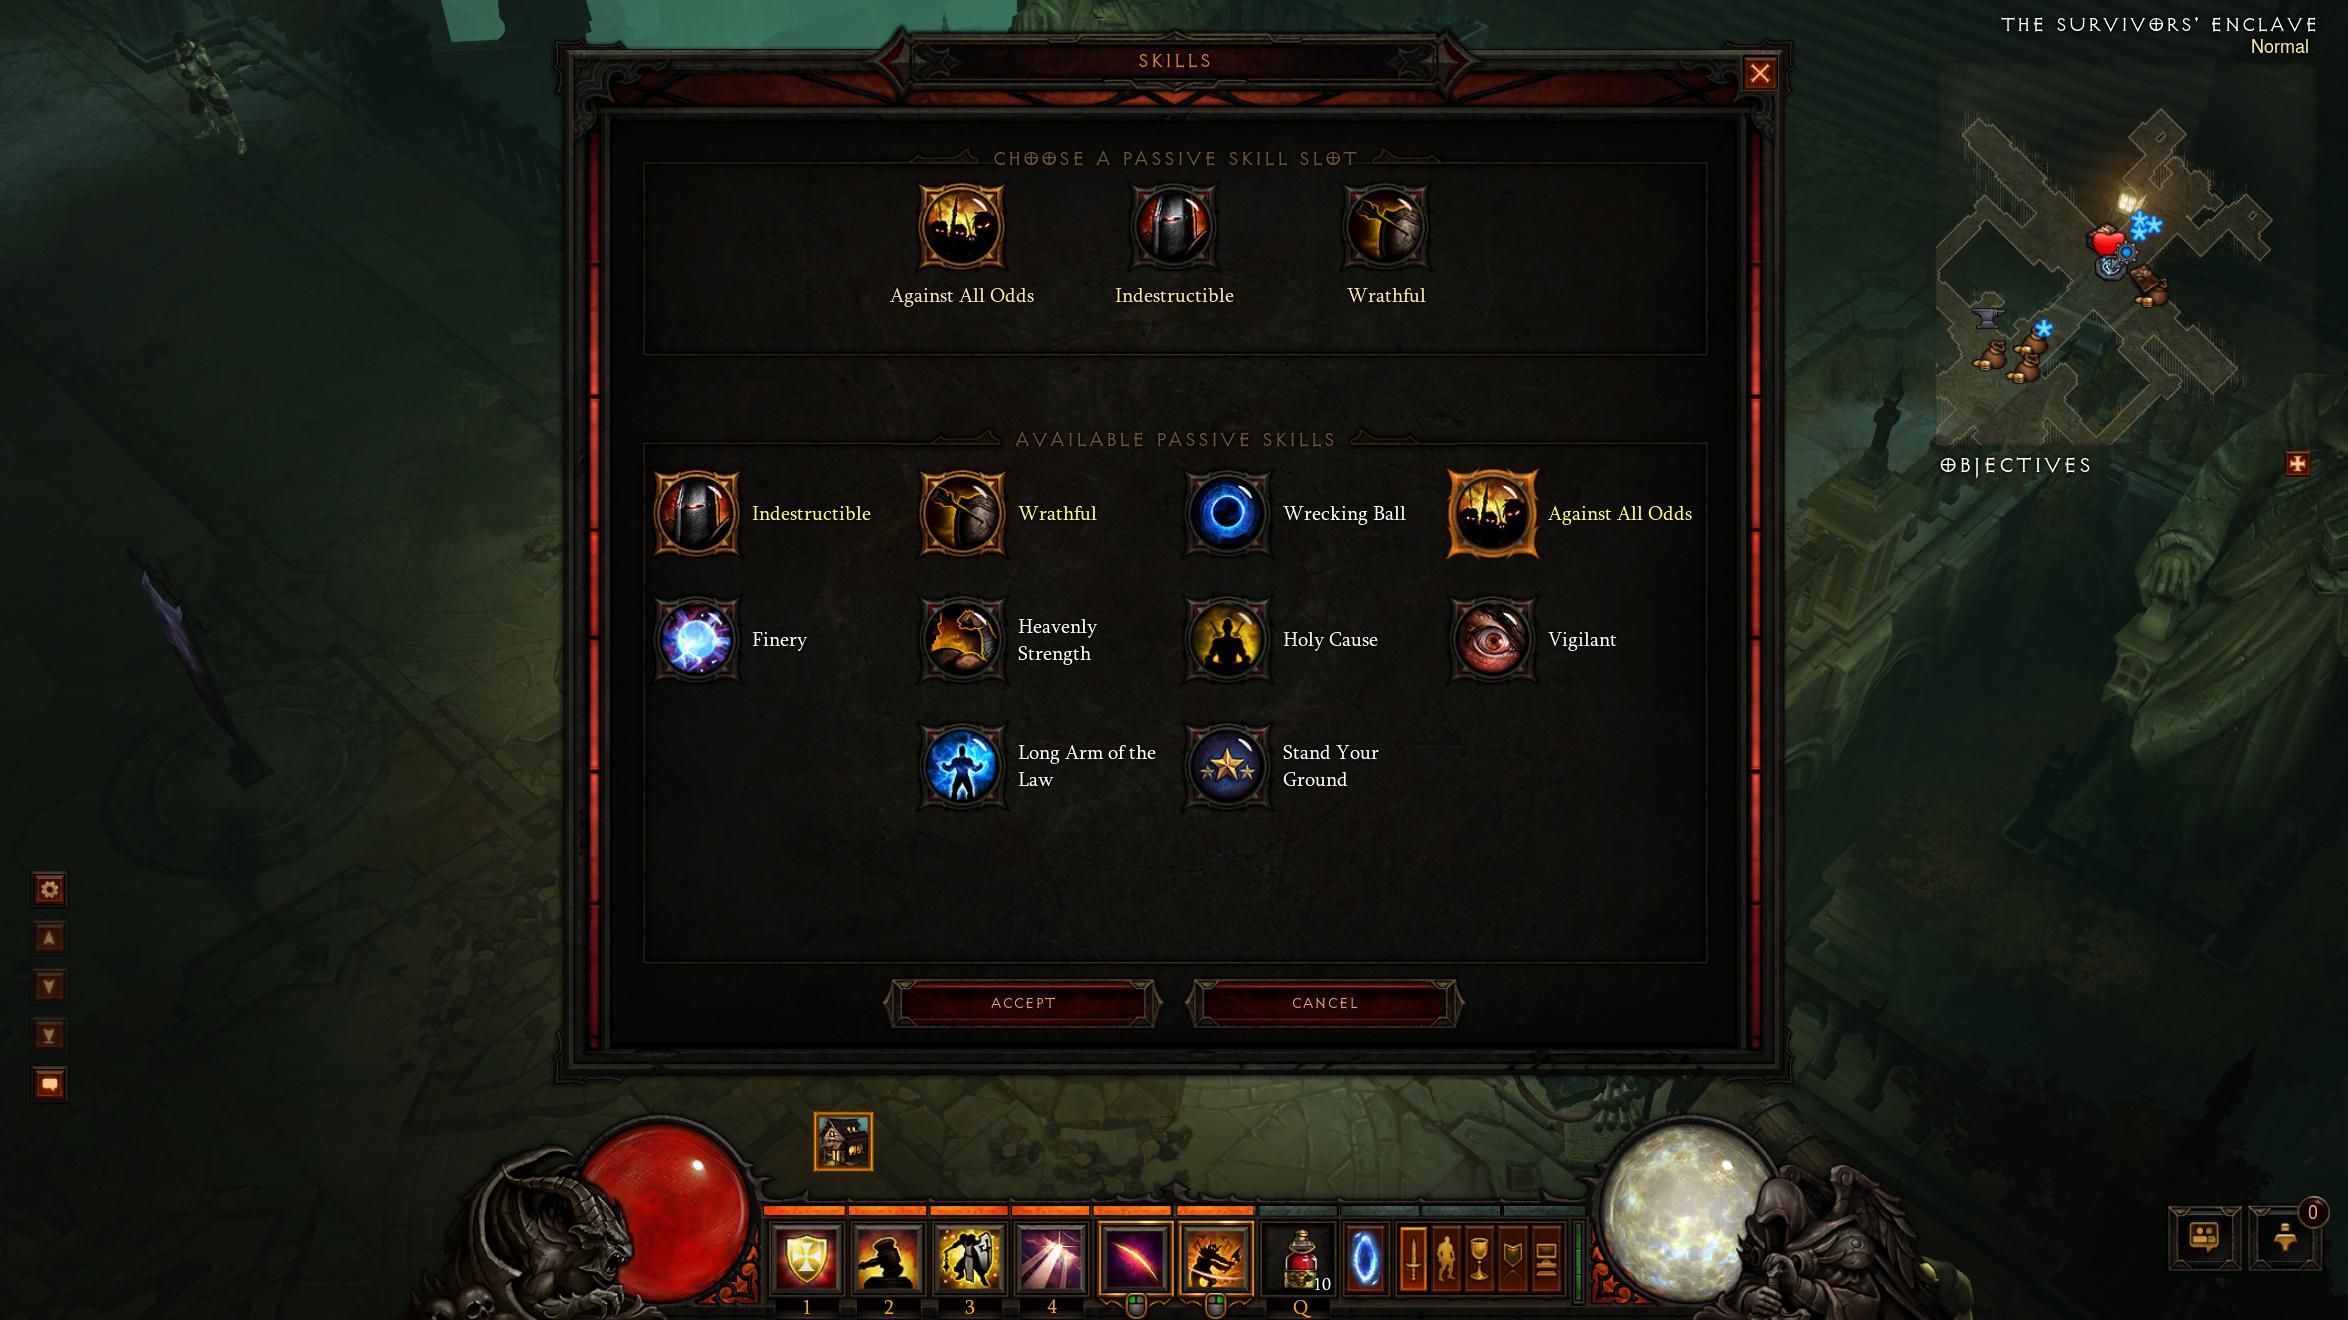 Reaper of souls nouvelle extension de Diablo III 253463814